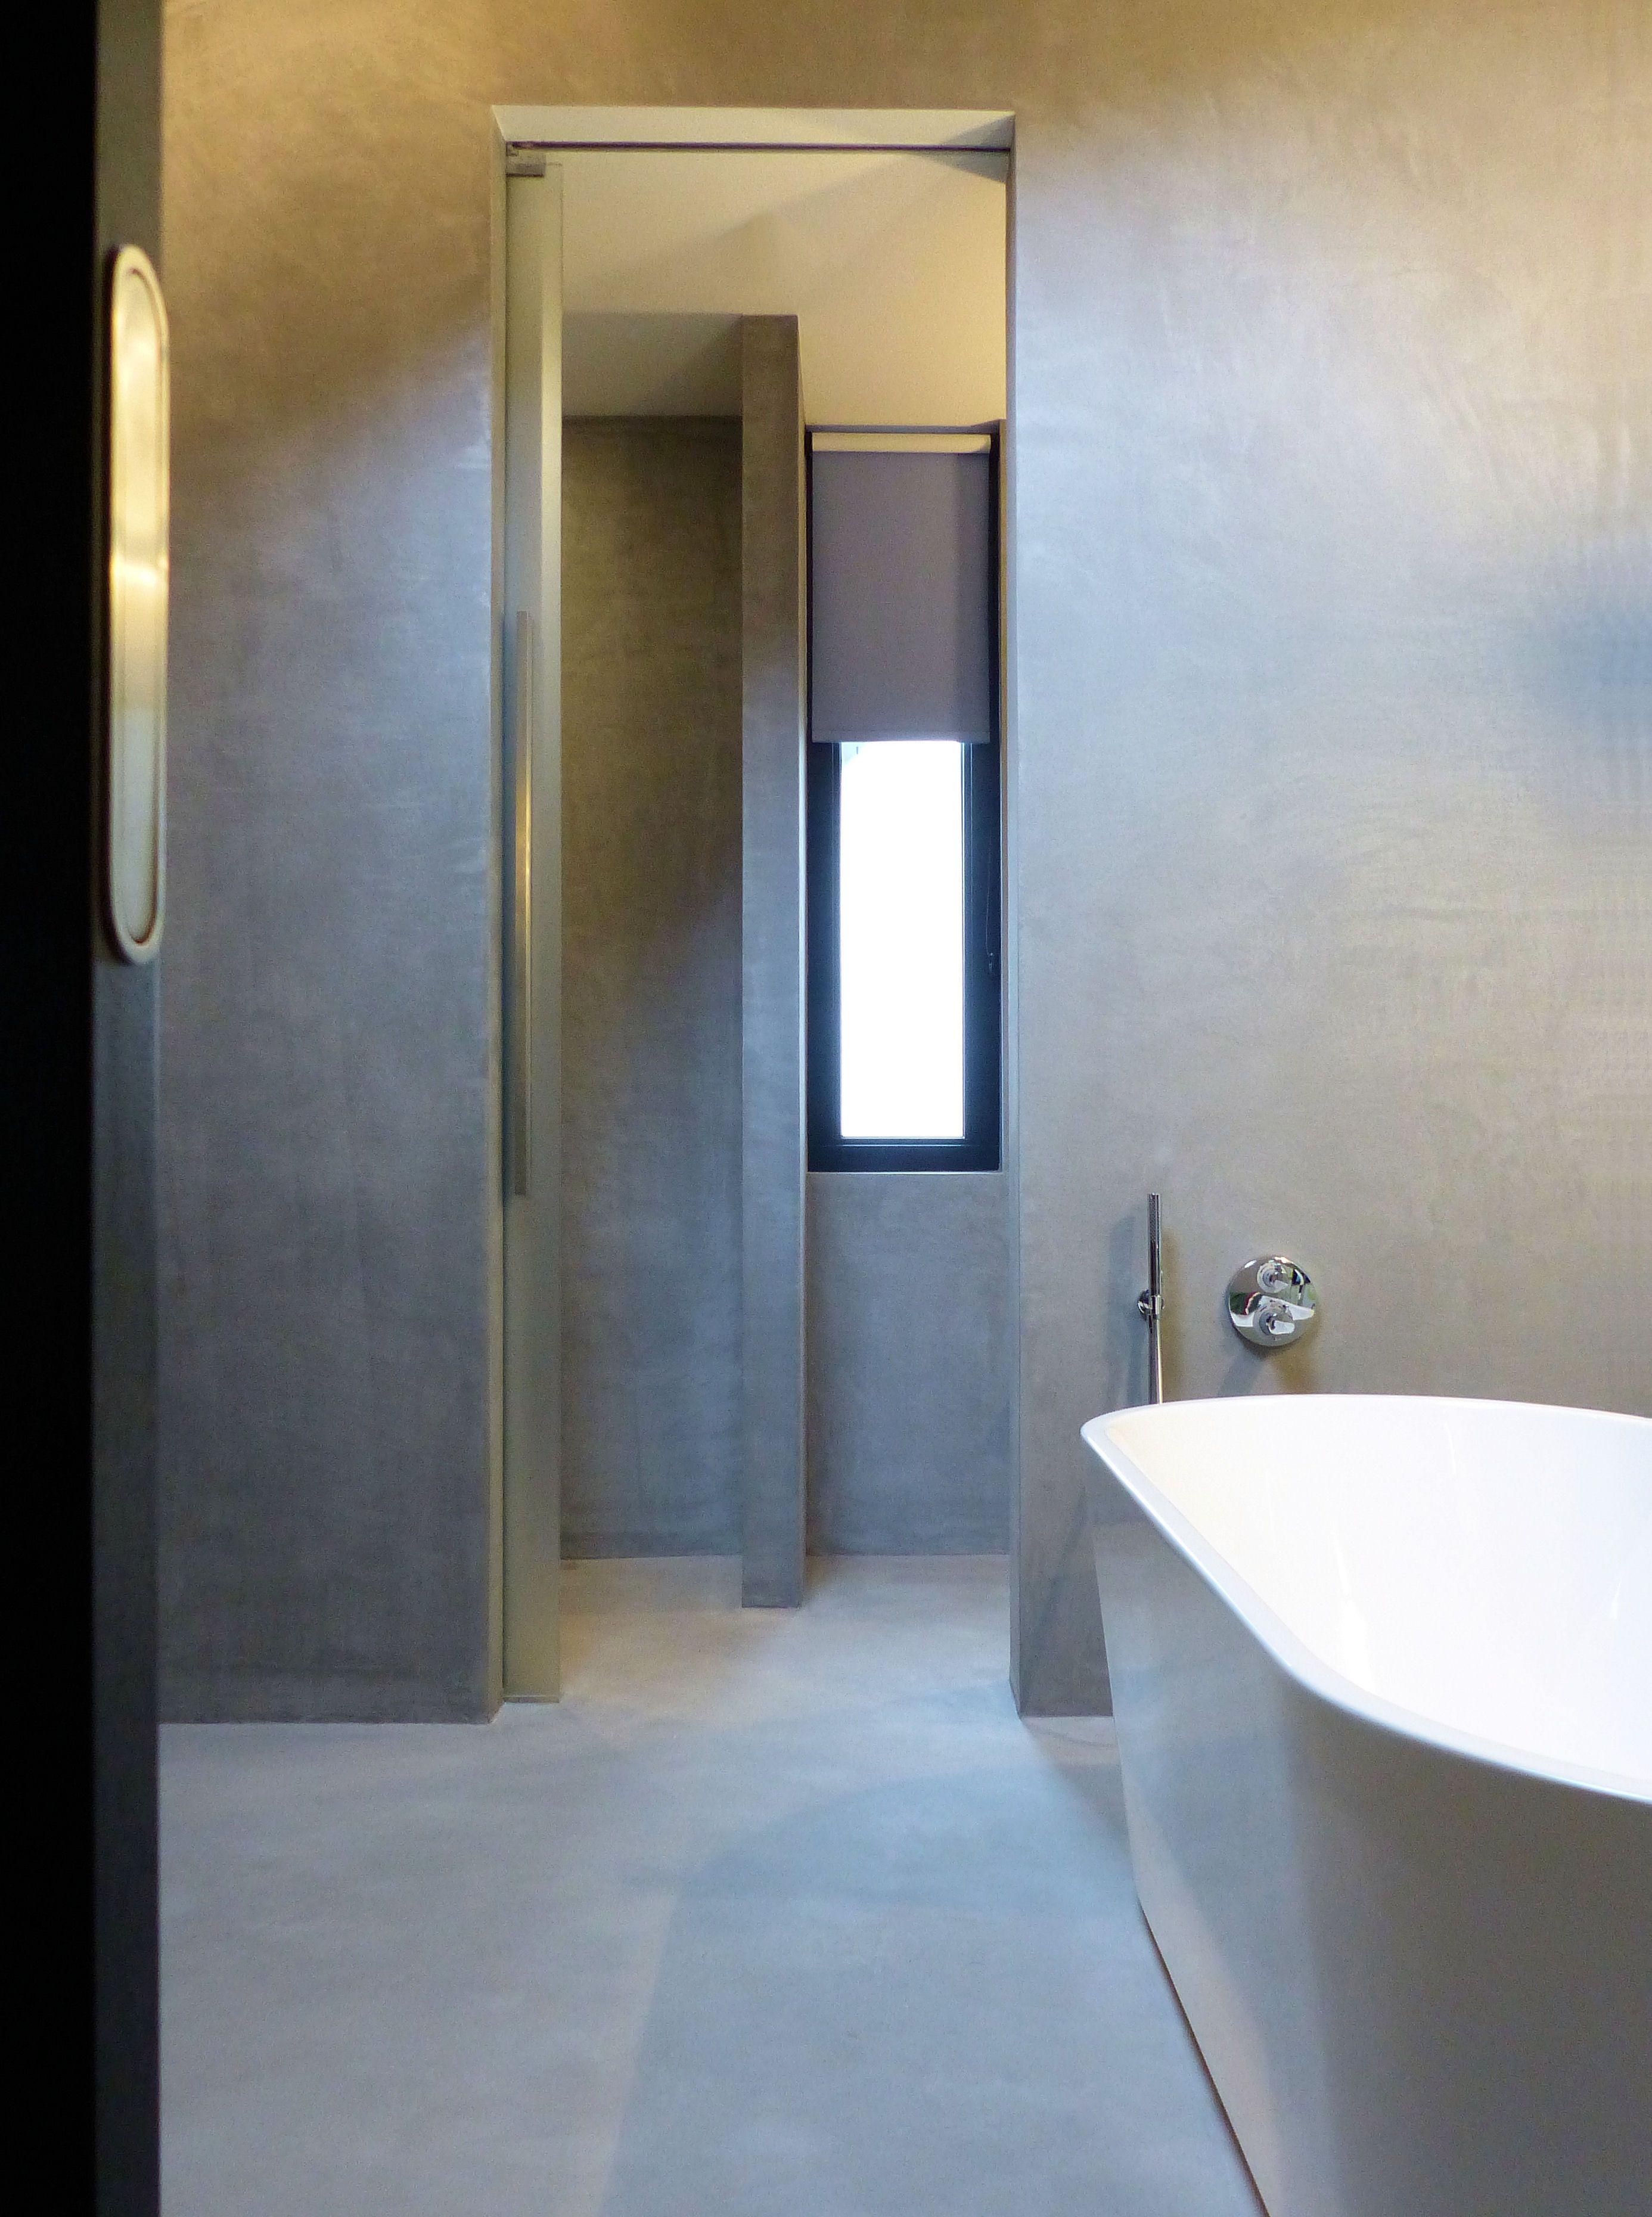 Bureau IN Uden architect | Badkamer | Pinterest - Badkamer ...